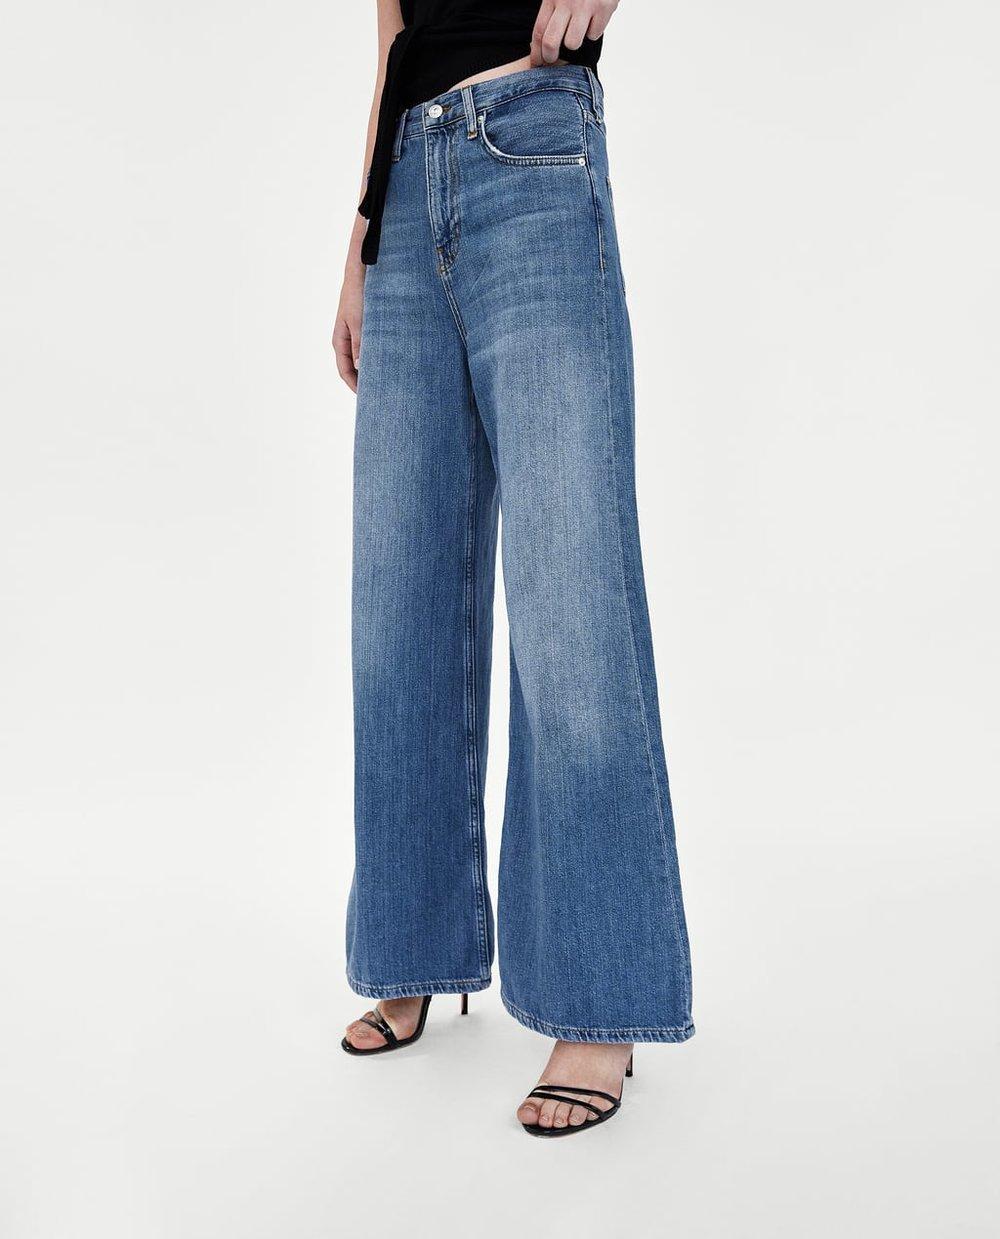 https://www.zara.com/ca/en/wide-leg-malibu-blue-jeans-p09699044.html?v1=5853056&v2=968929